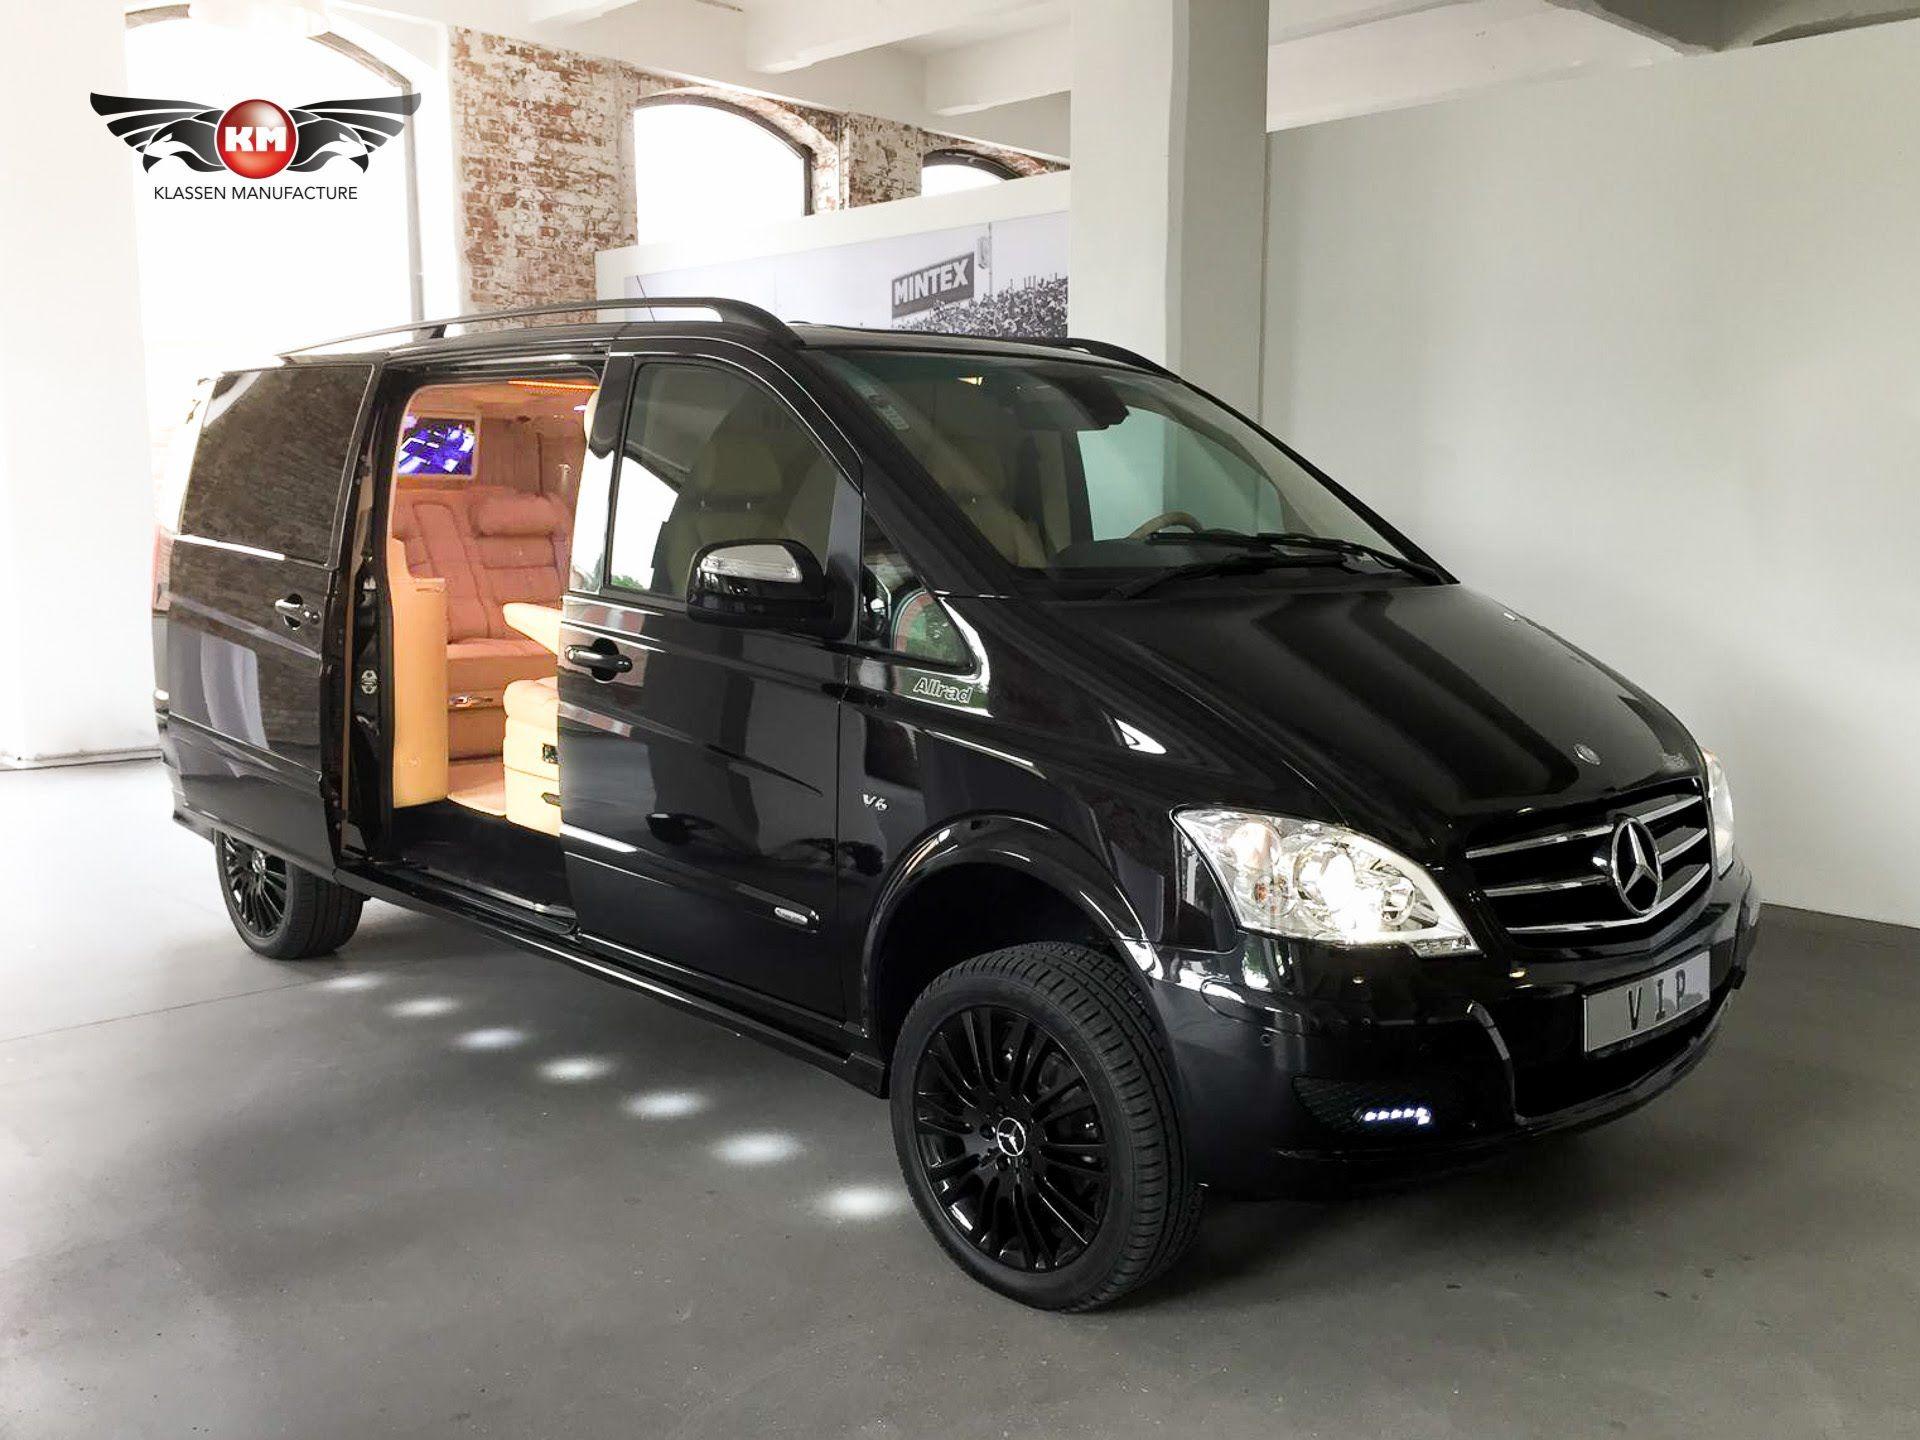 Mercedes Benz Viano 3 5 V6 4matic Vip Edition Luxury Van Conversion By Mercedes Benz Viano Mercedes Benz Vito Luxury Van